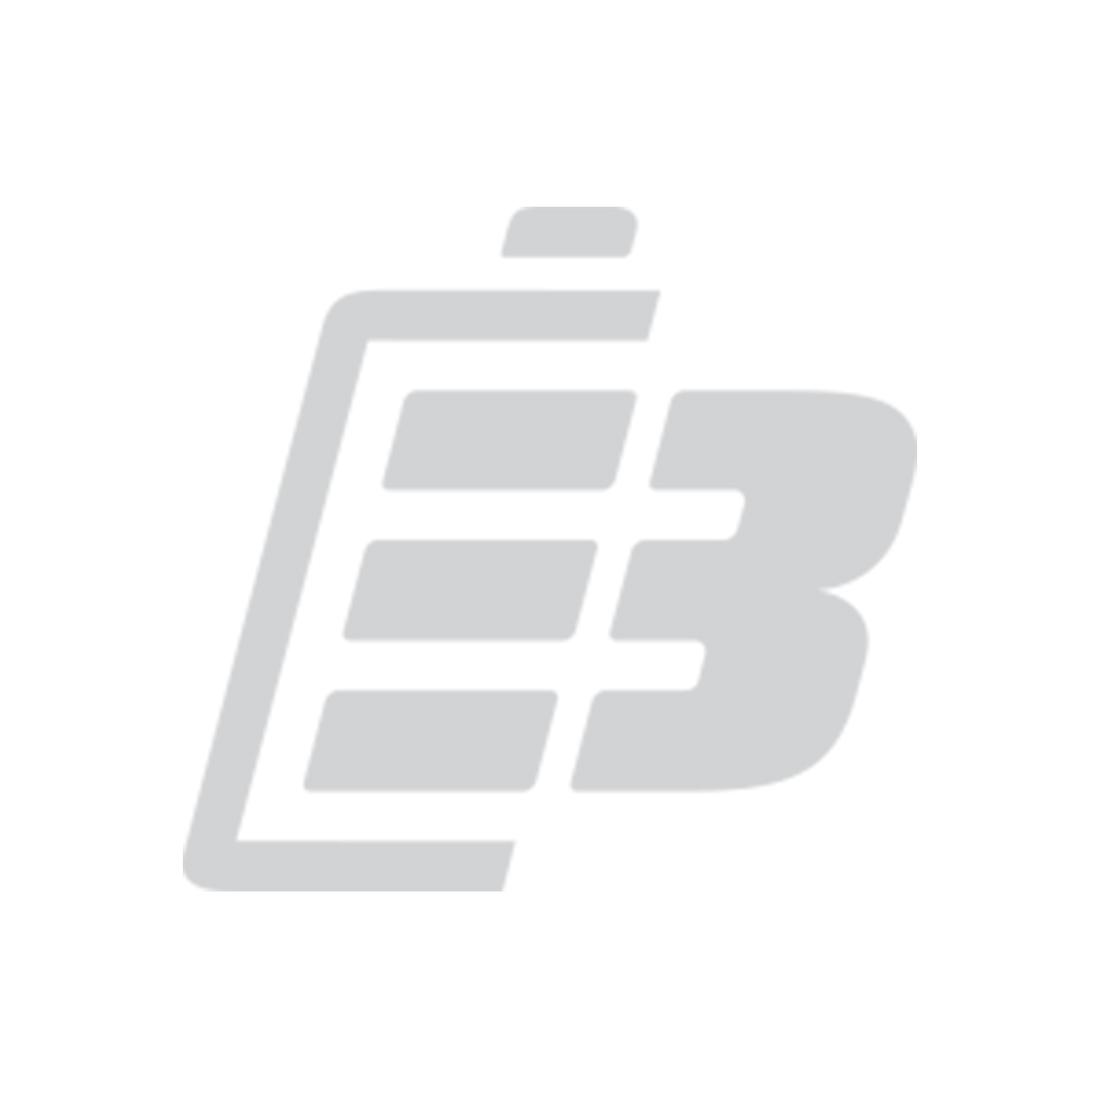 Laptop Battery Hp Pavilion 15 Ab000 2200mah Full Compatible